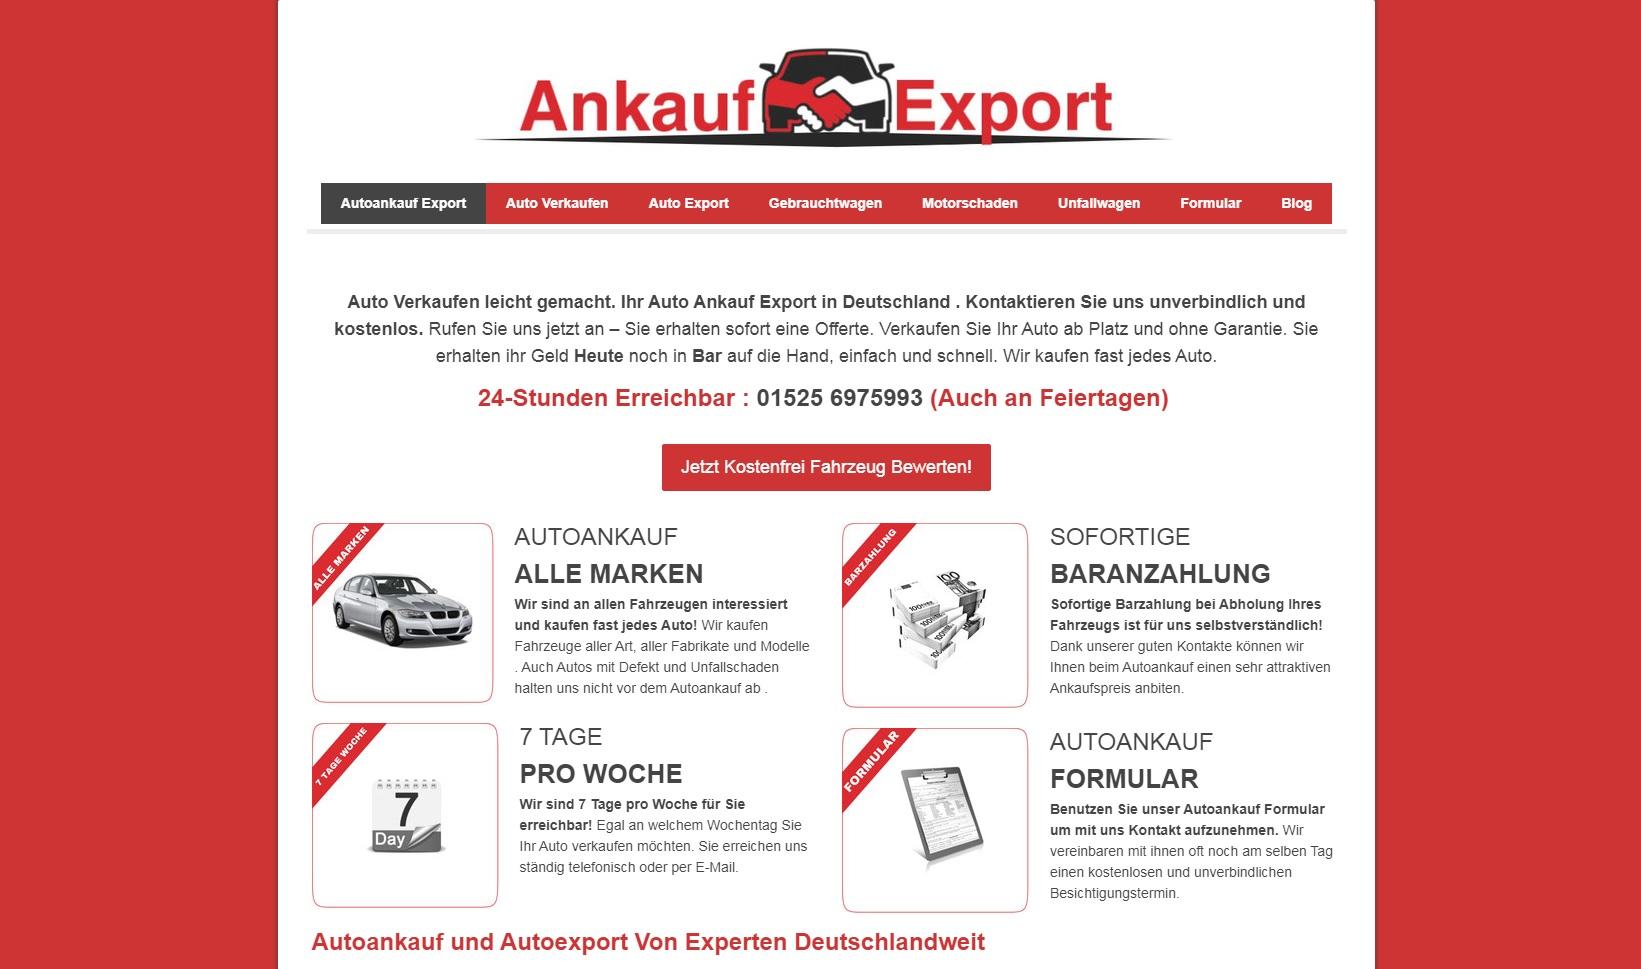 Autoankauf in Chemnitz